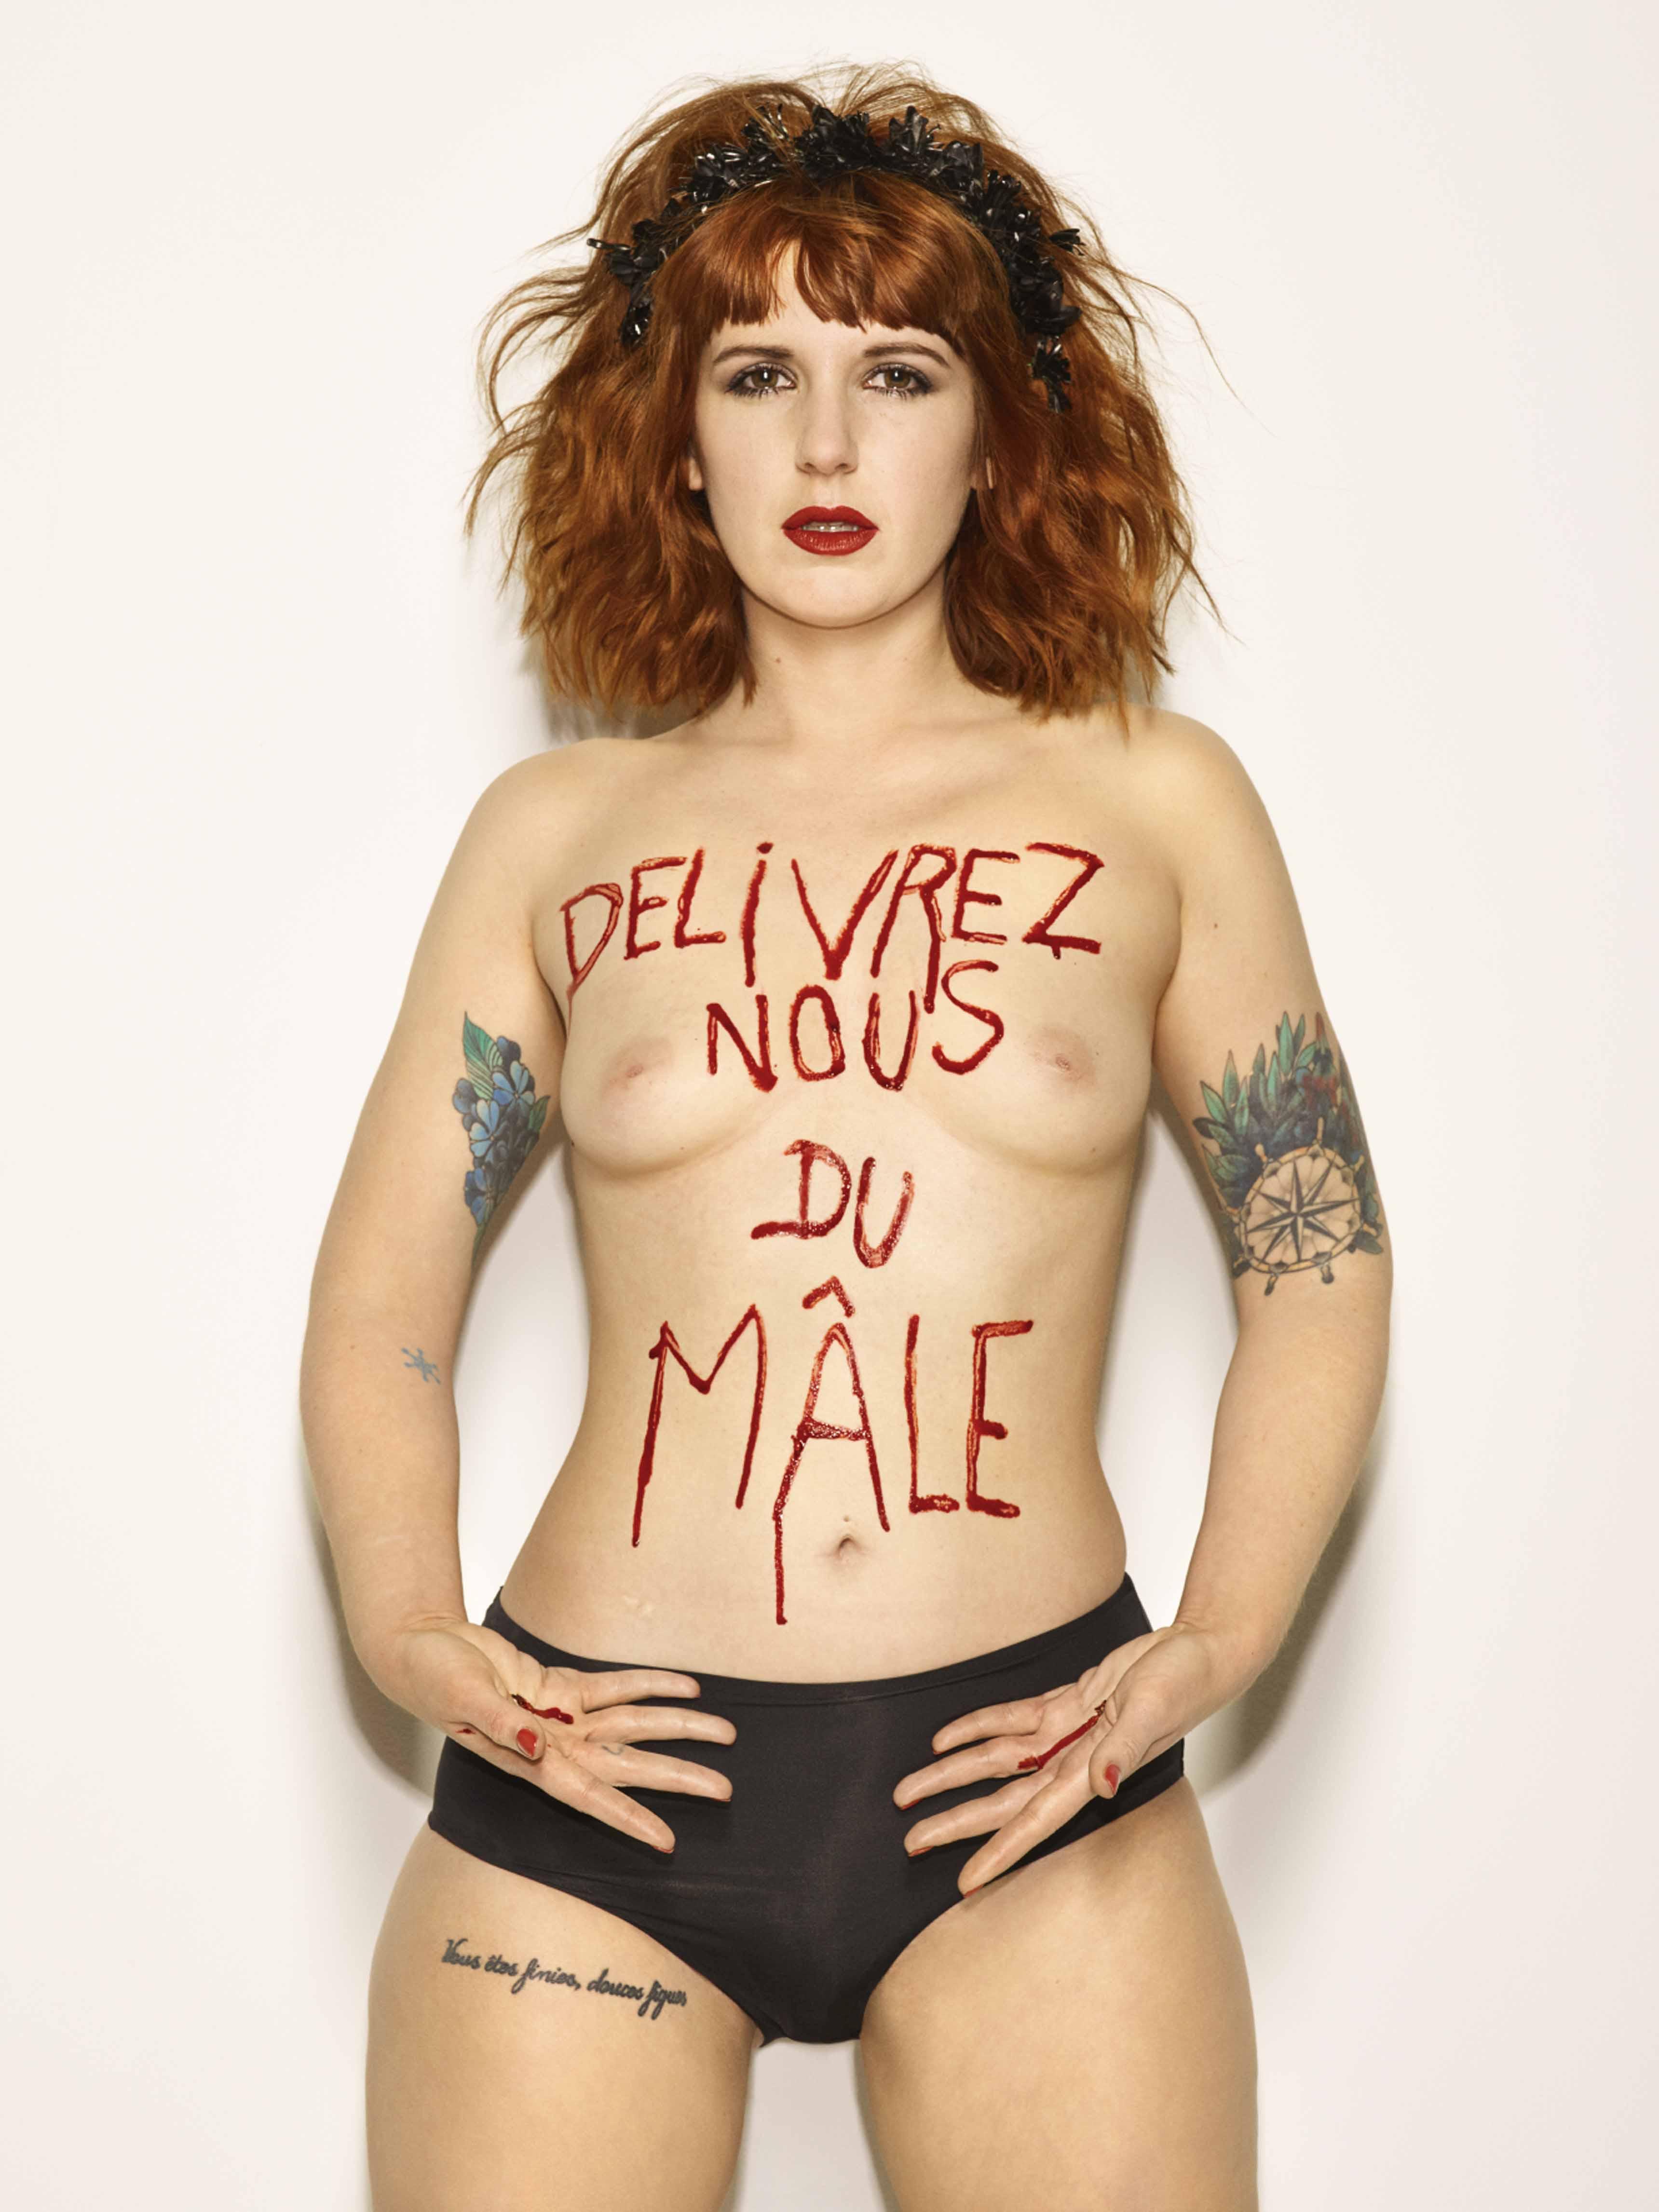 Bettina Rheims, Sarah Constantin, Délivrez nous du Mâle, mai 2017, Paris © Bettina Rheims courtesy Galerie Xippas